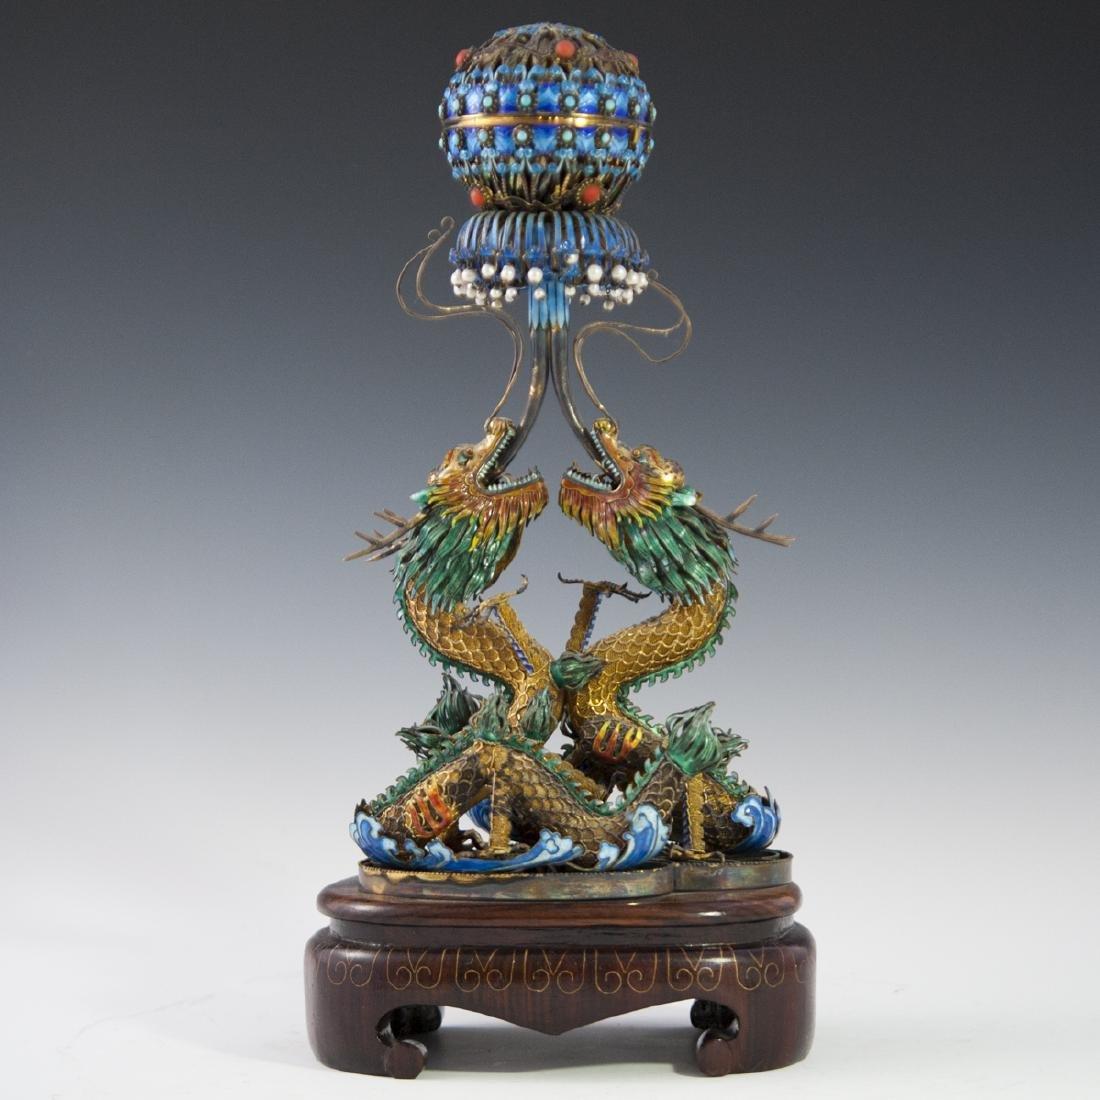 Chinese Vermeil Silver Enamel Cloisonne Caddy